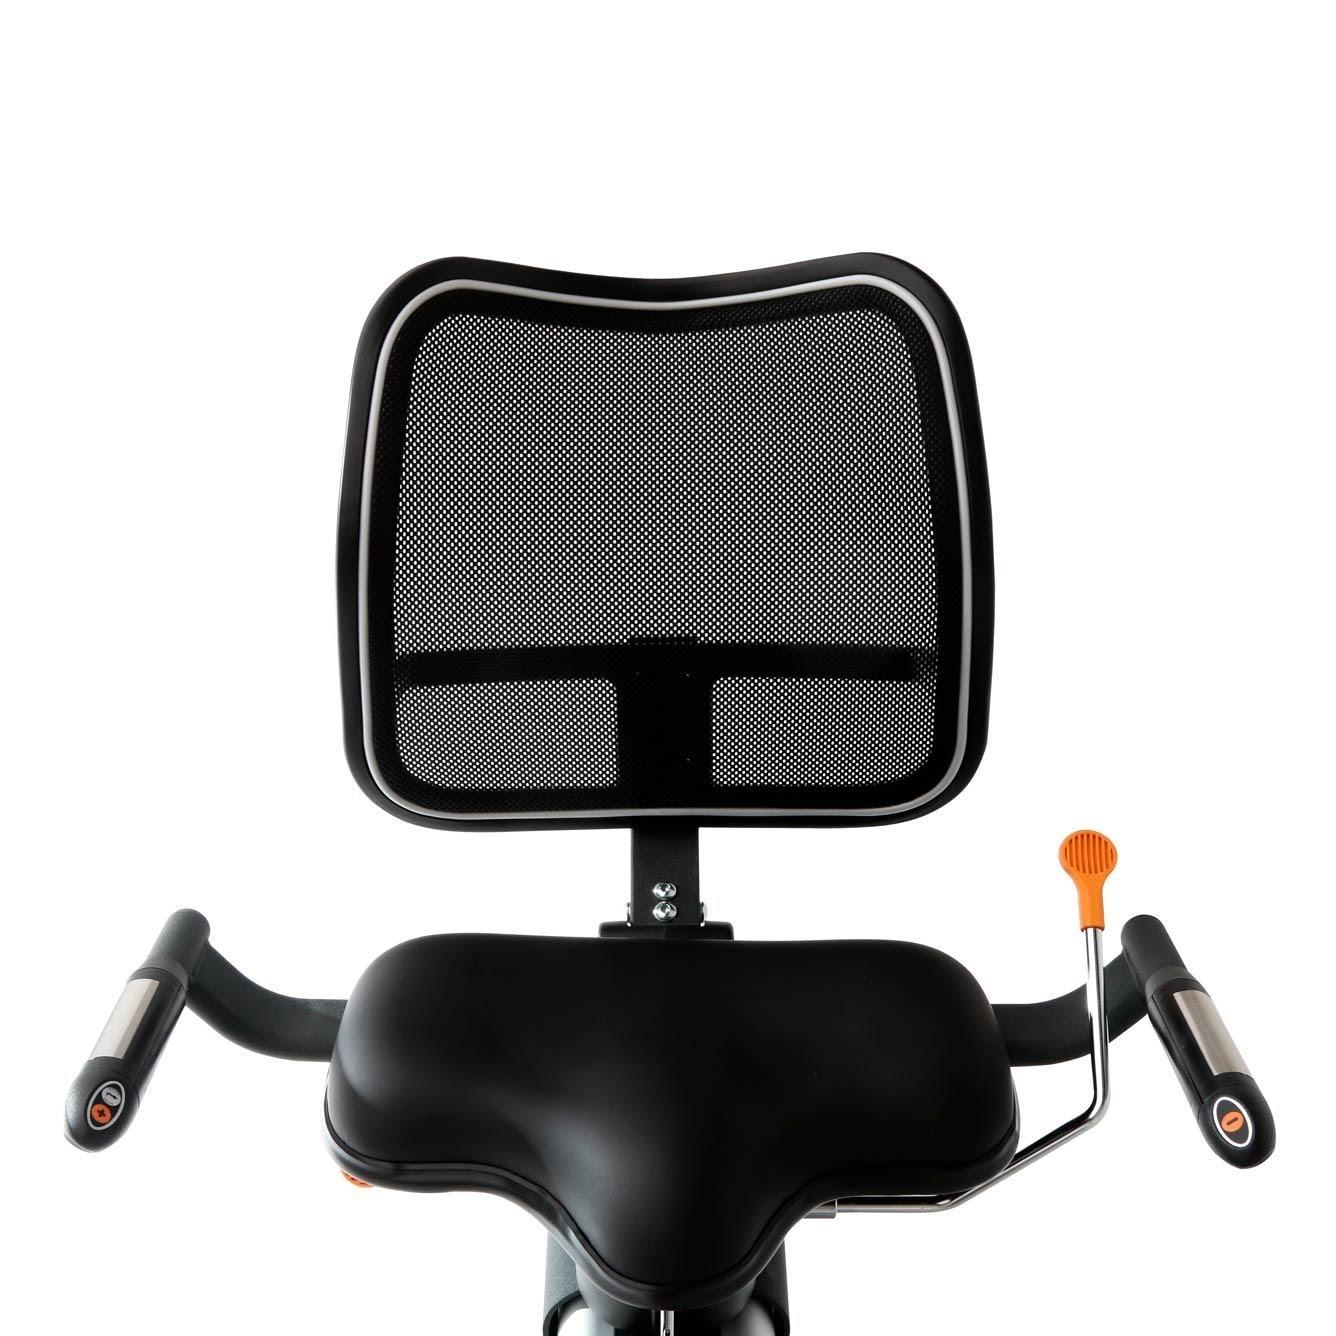 Exercise Bike Zone: 3G Cardio Elite RB Recumbent Exercise